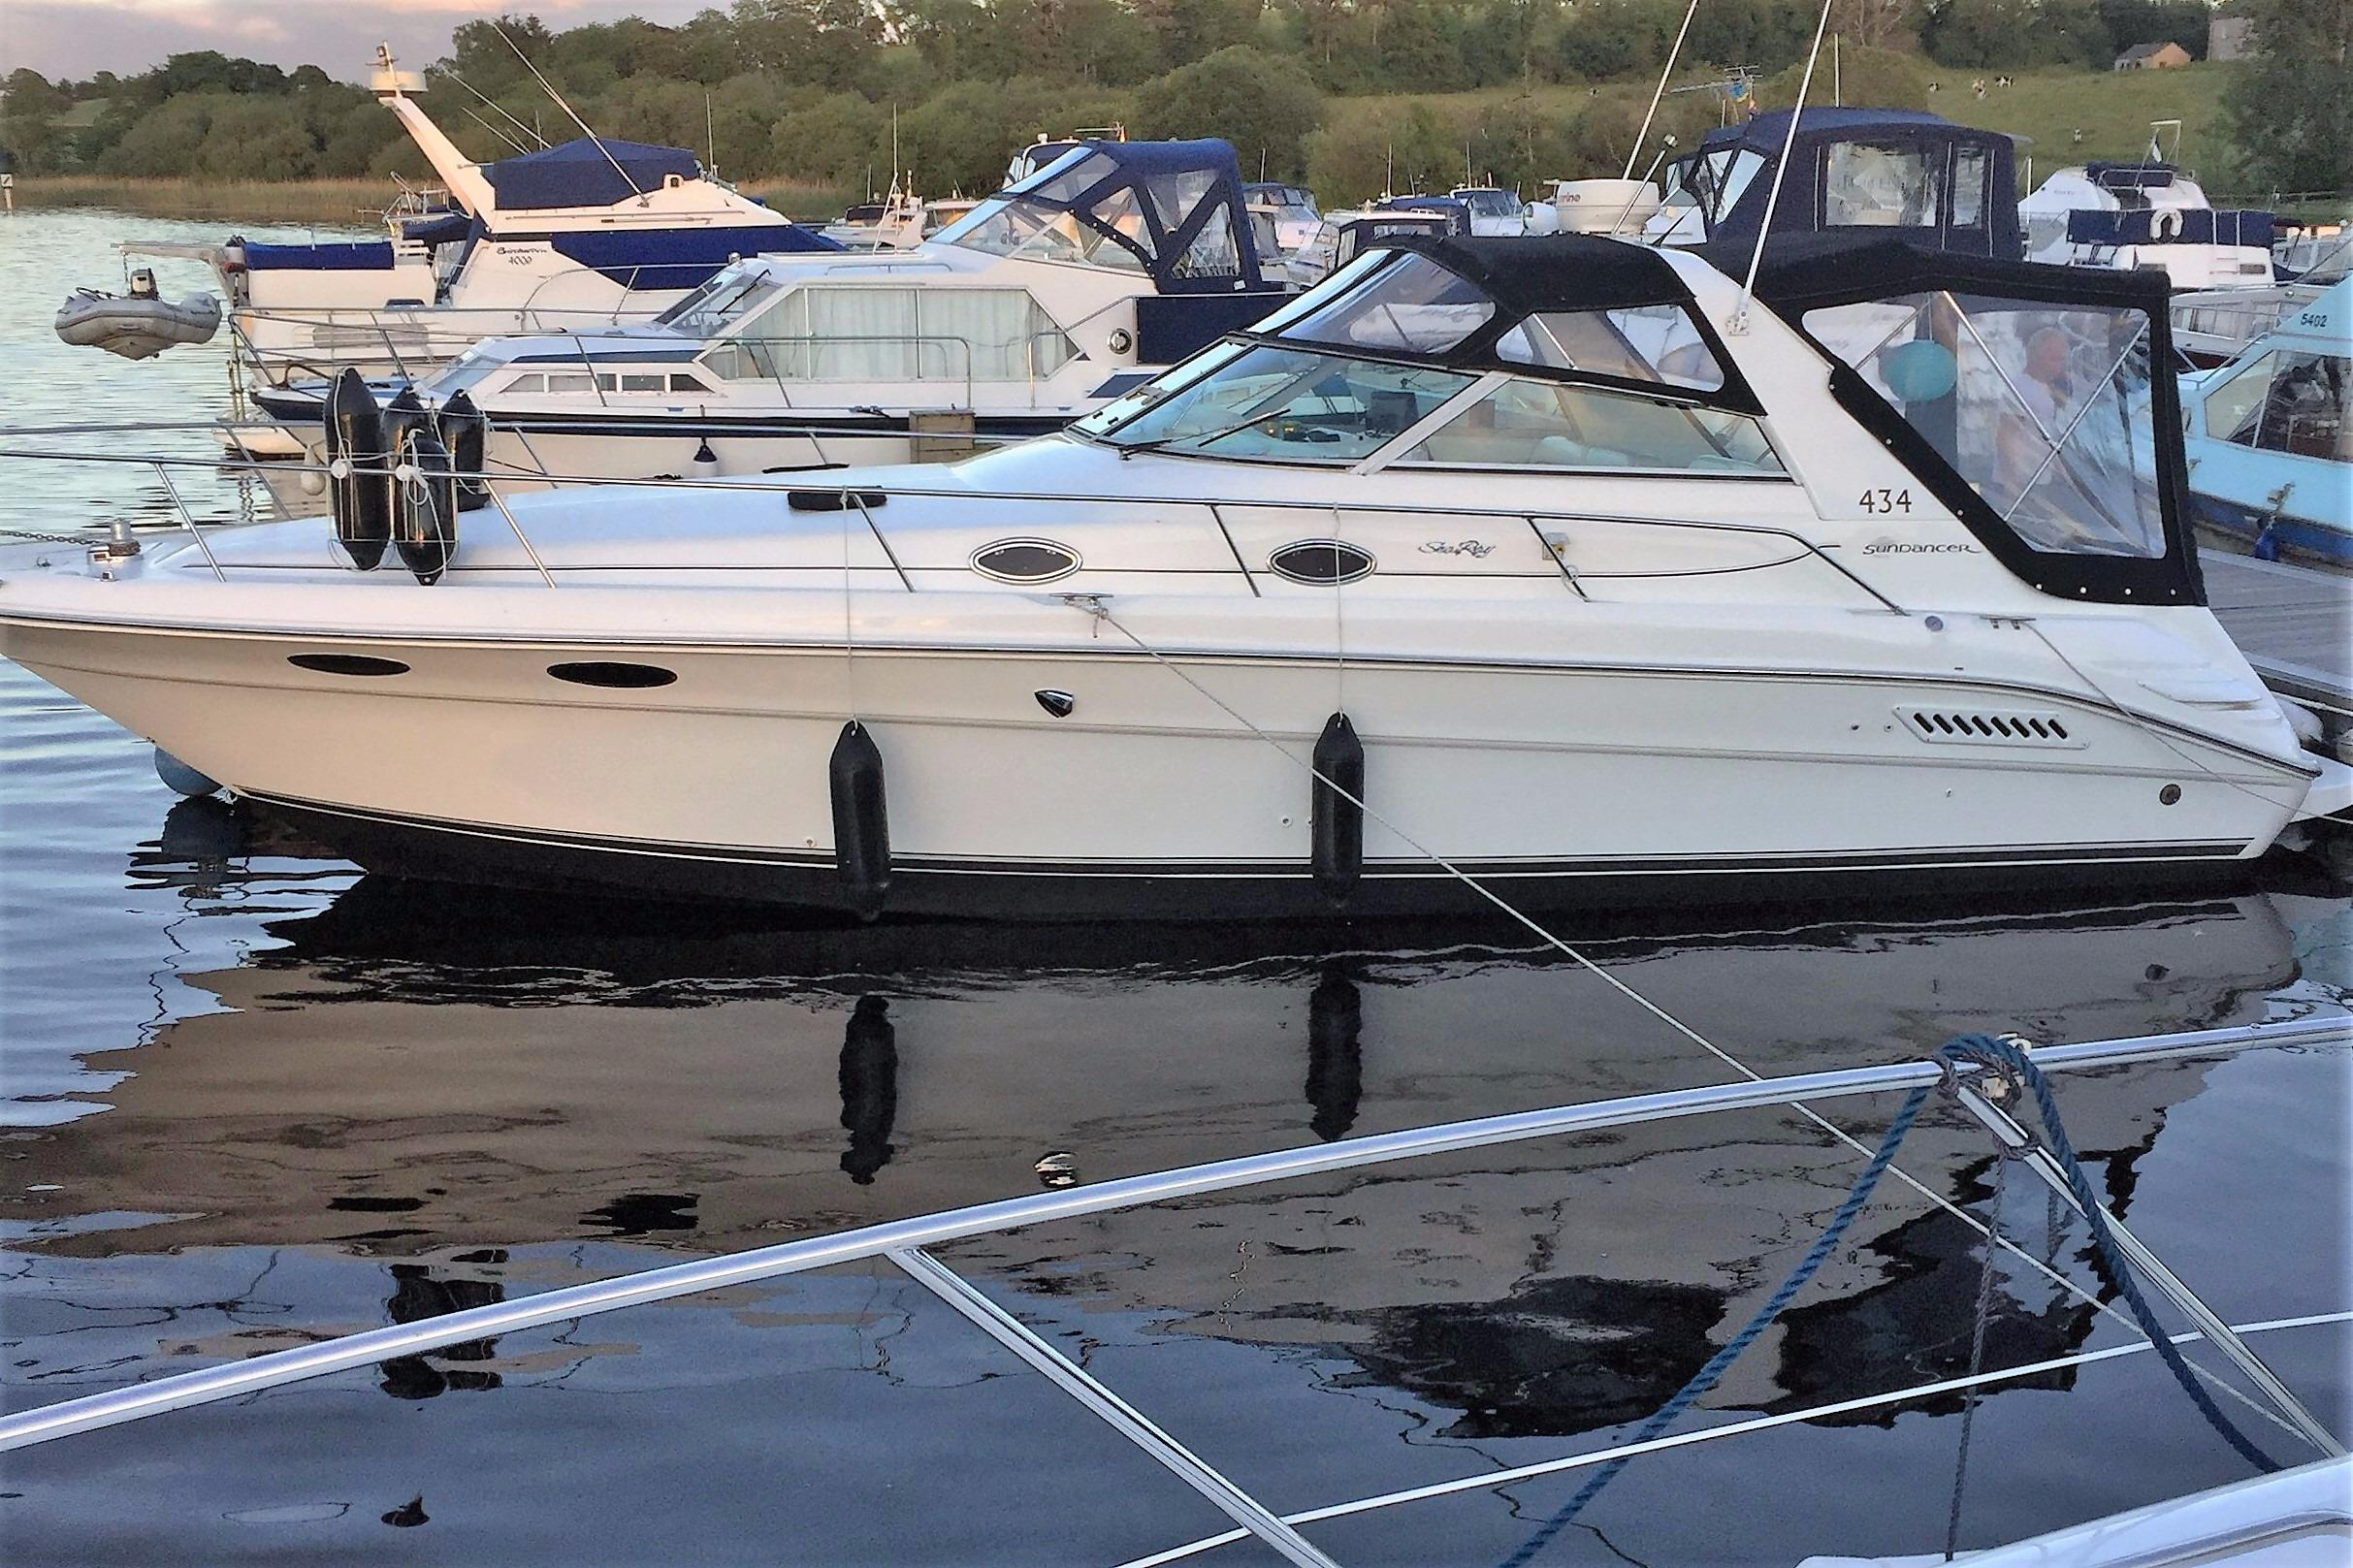 Sea Ray 1996 330 Wiring Diagram Triton Boats Trailer Wire Sundancer United Kingdom Bj Marine Rh Bjmarine Net Battery Switch